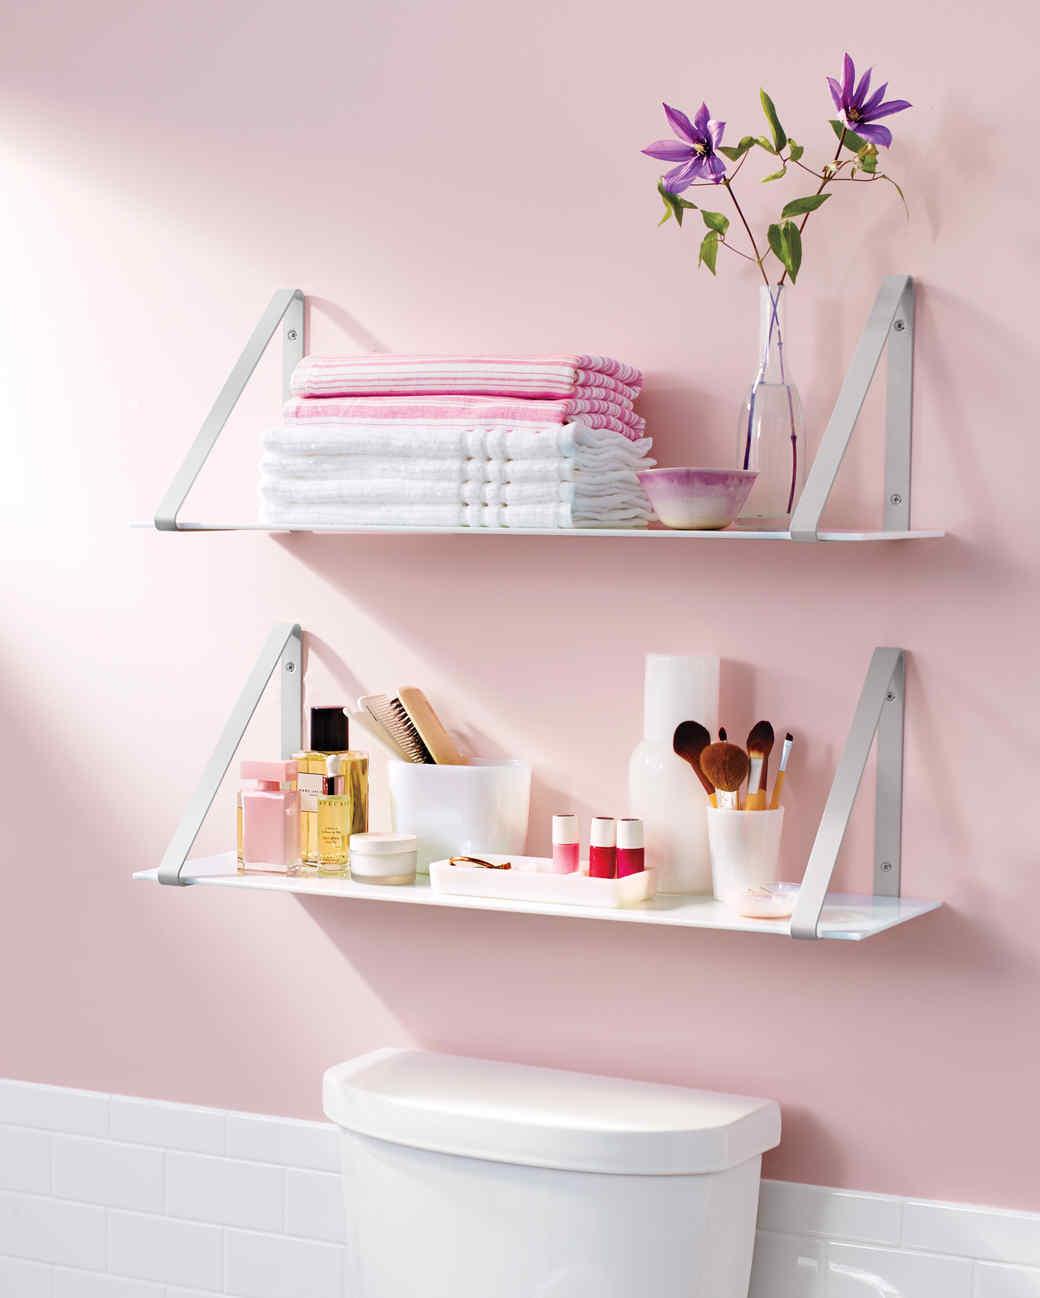 shelving-bathroom-315-d112185.jpg